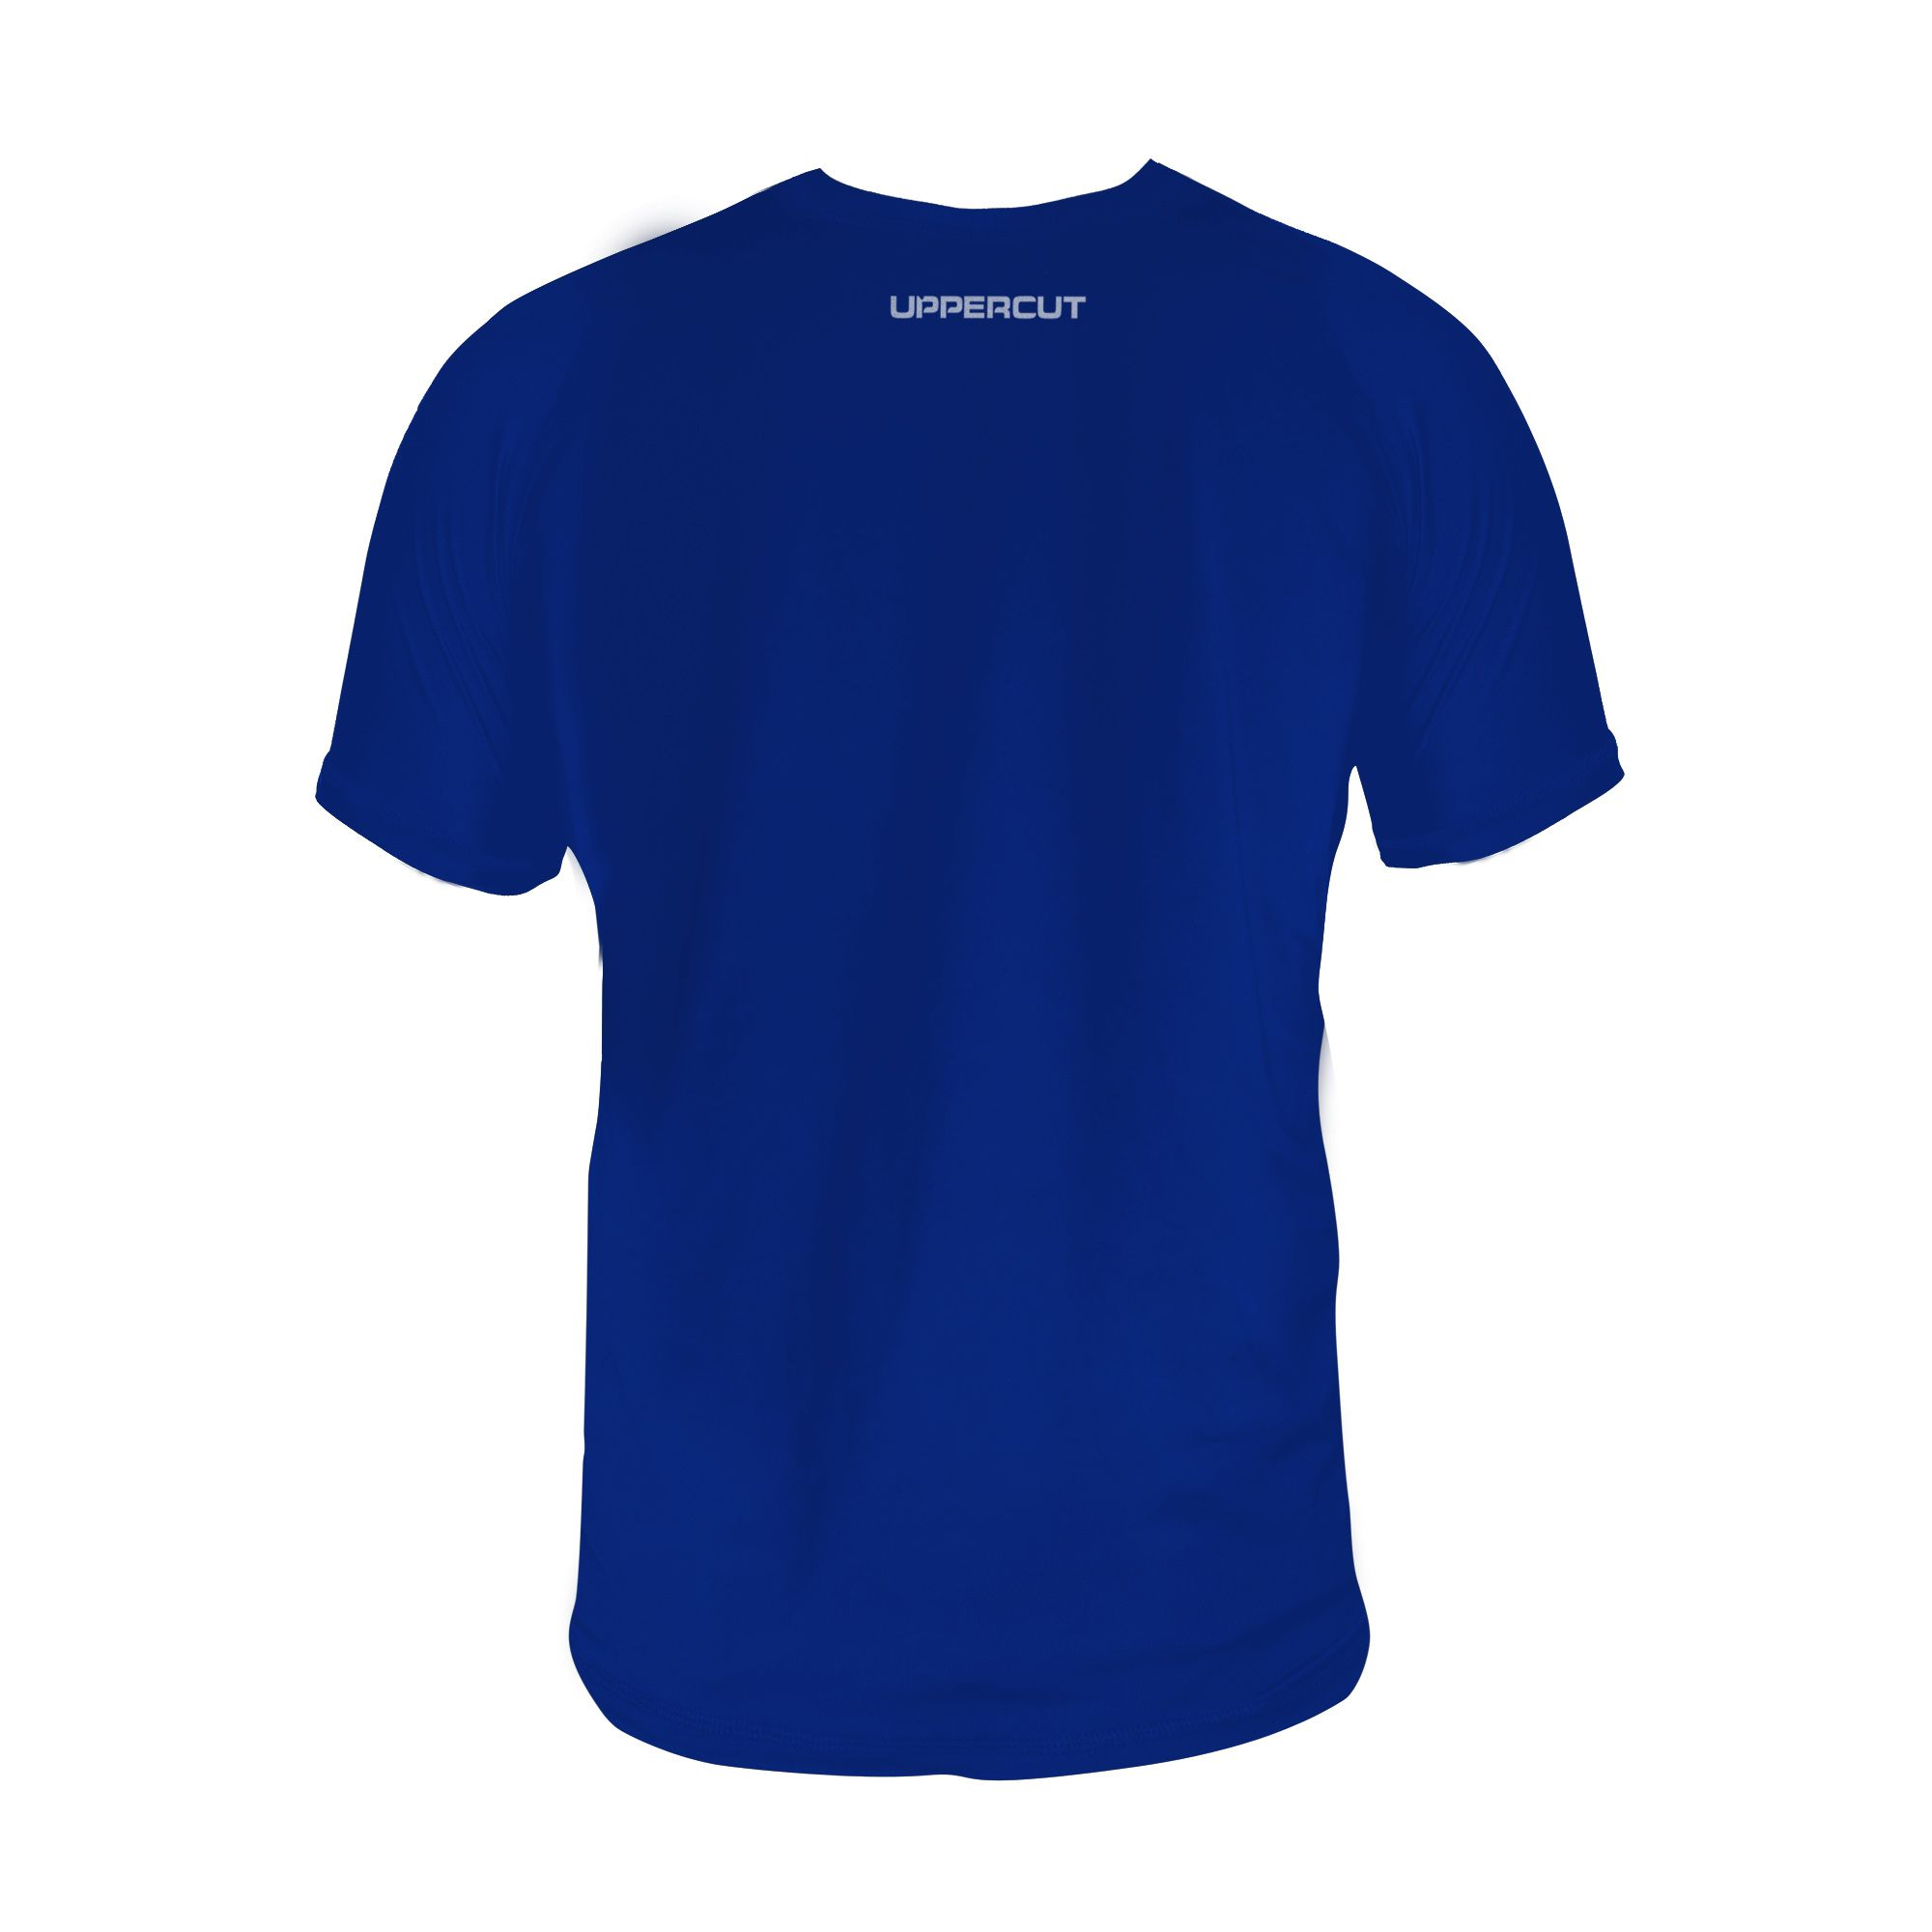 Camisa  Jiu-Jitsu Azul Uppercut  Dry U.V